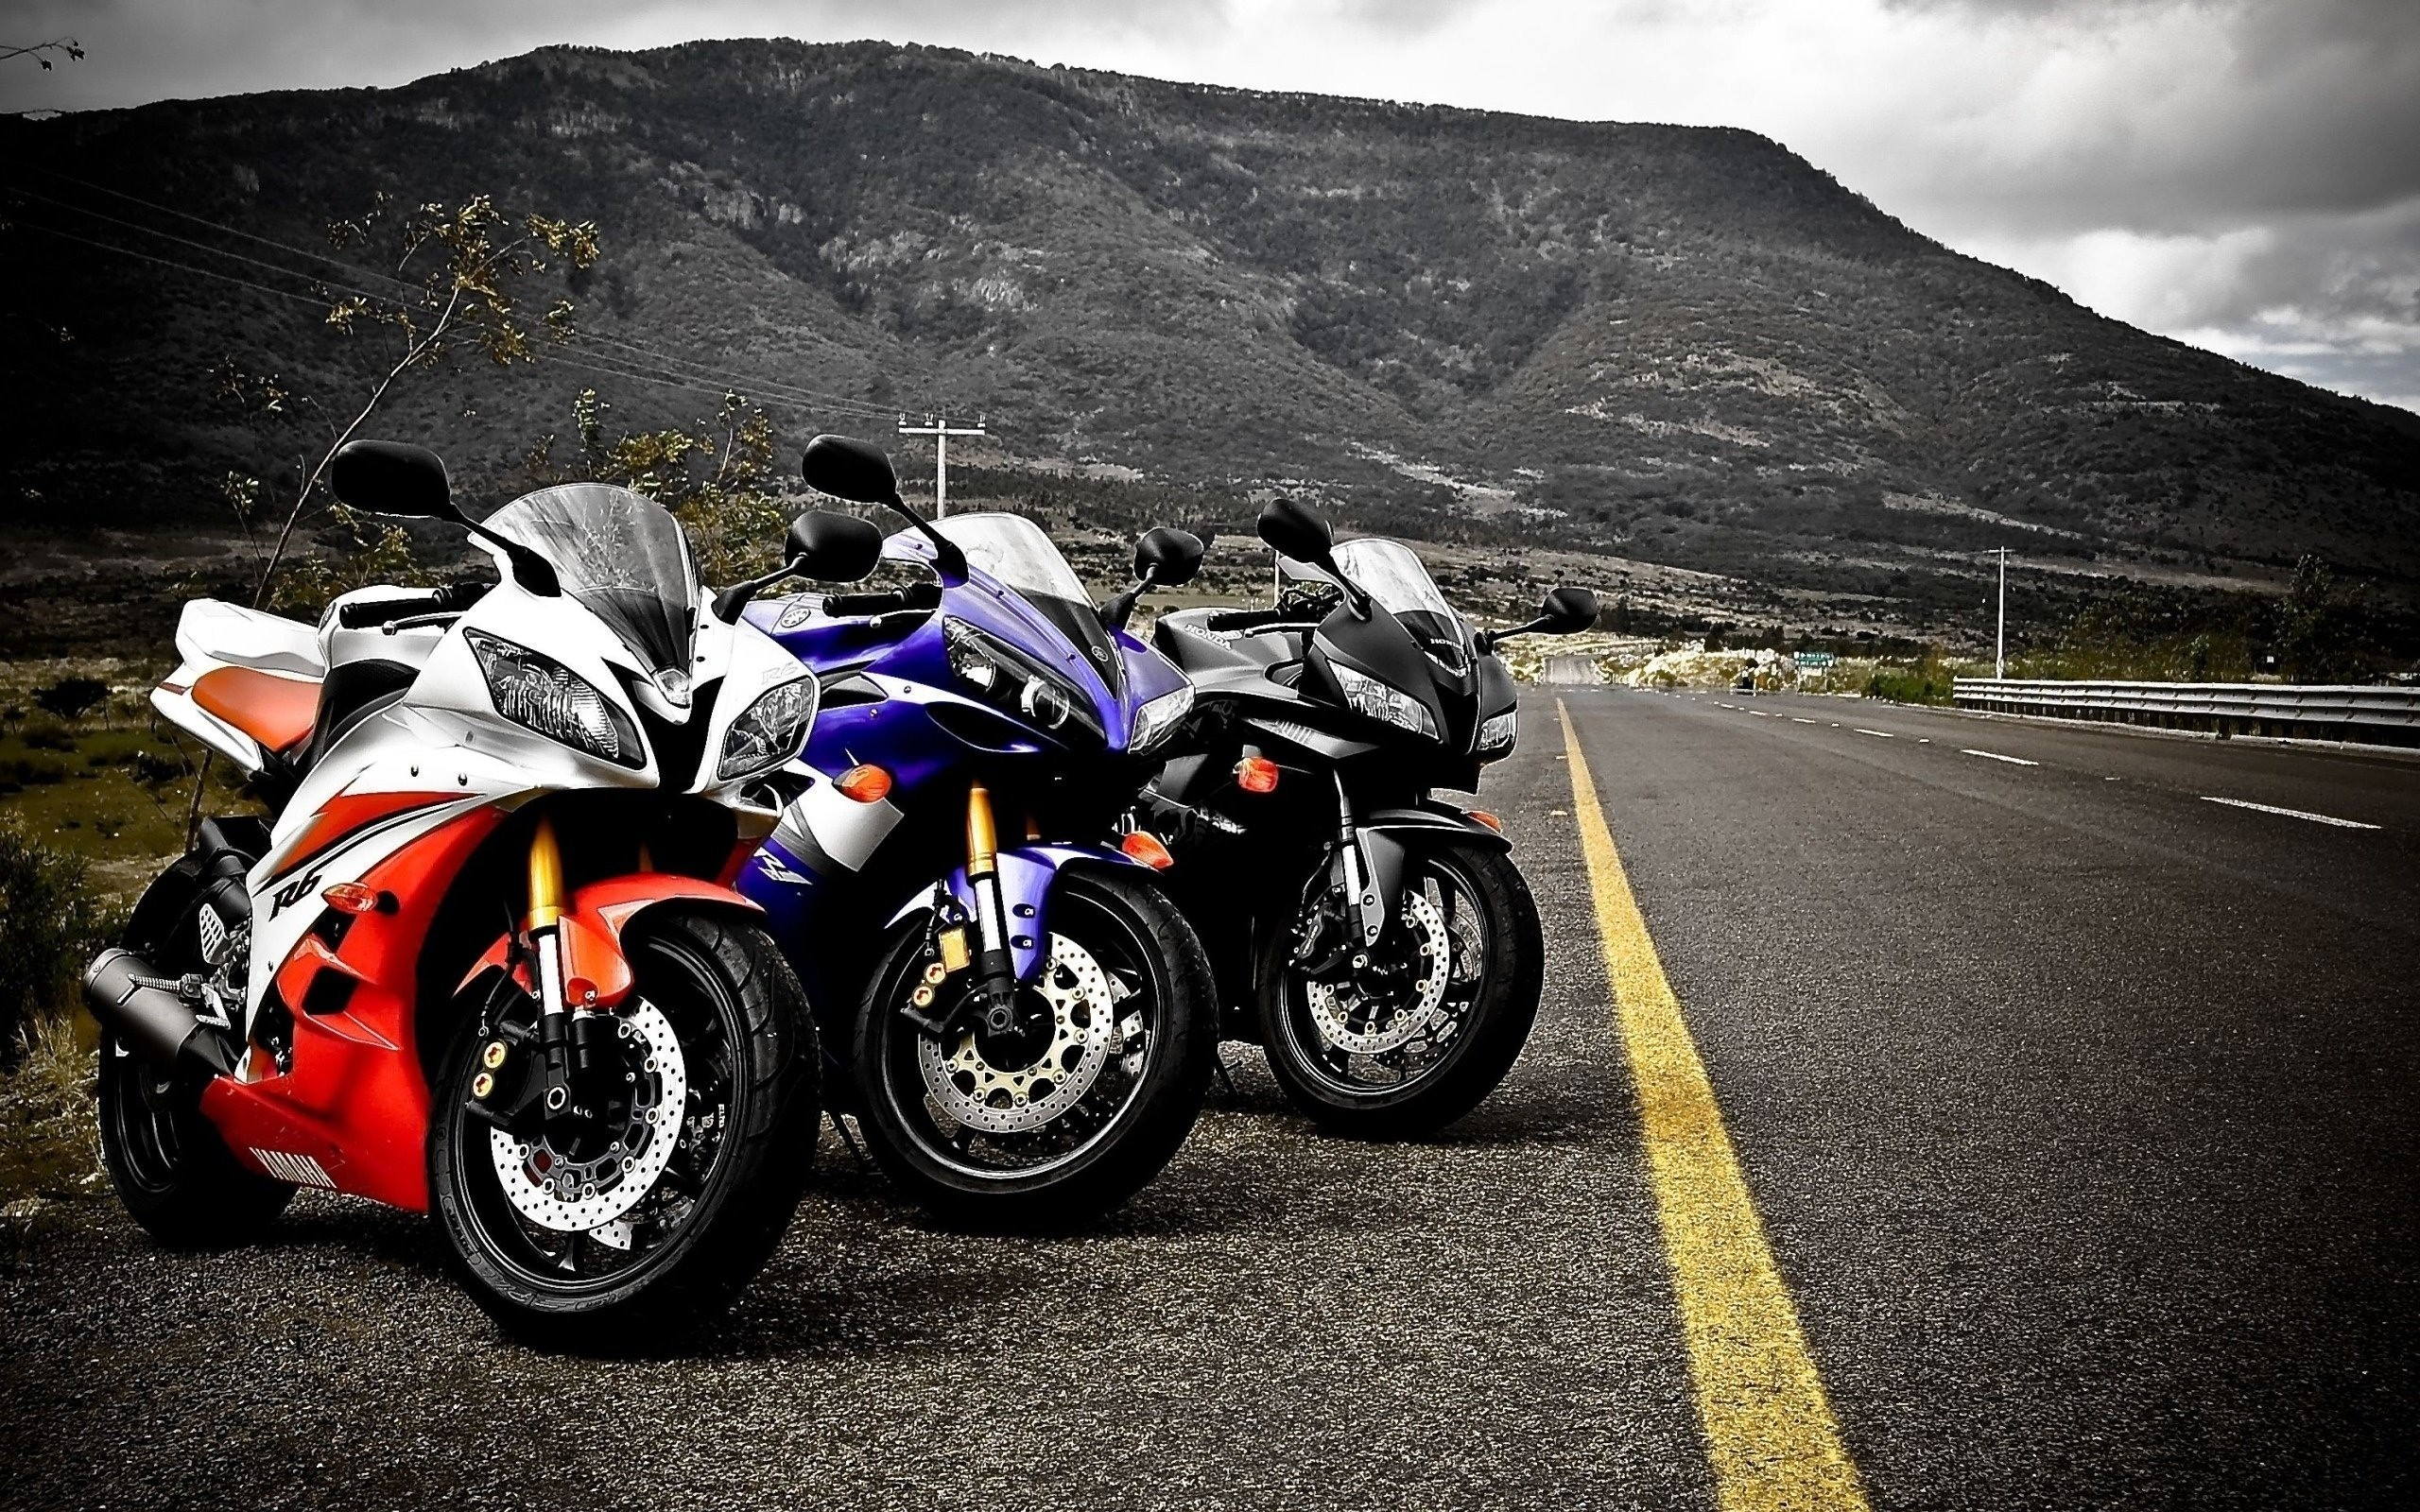 Superbike Wallpaper 77 Images